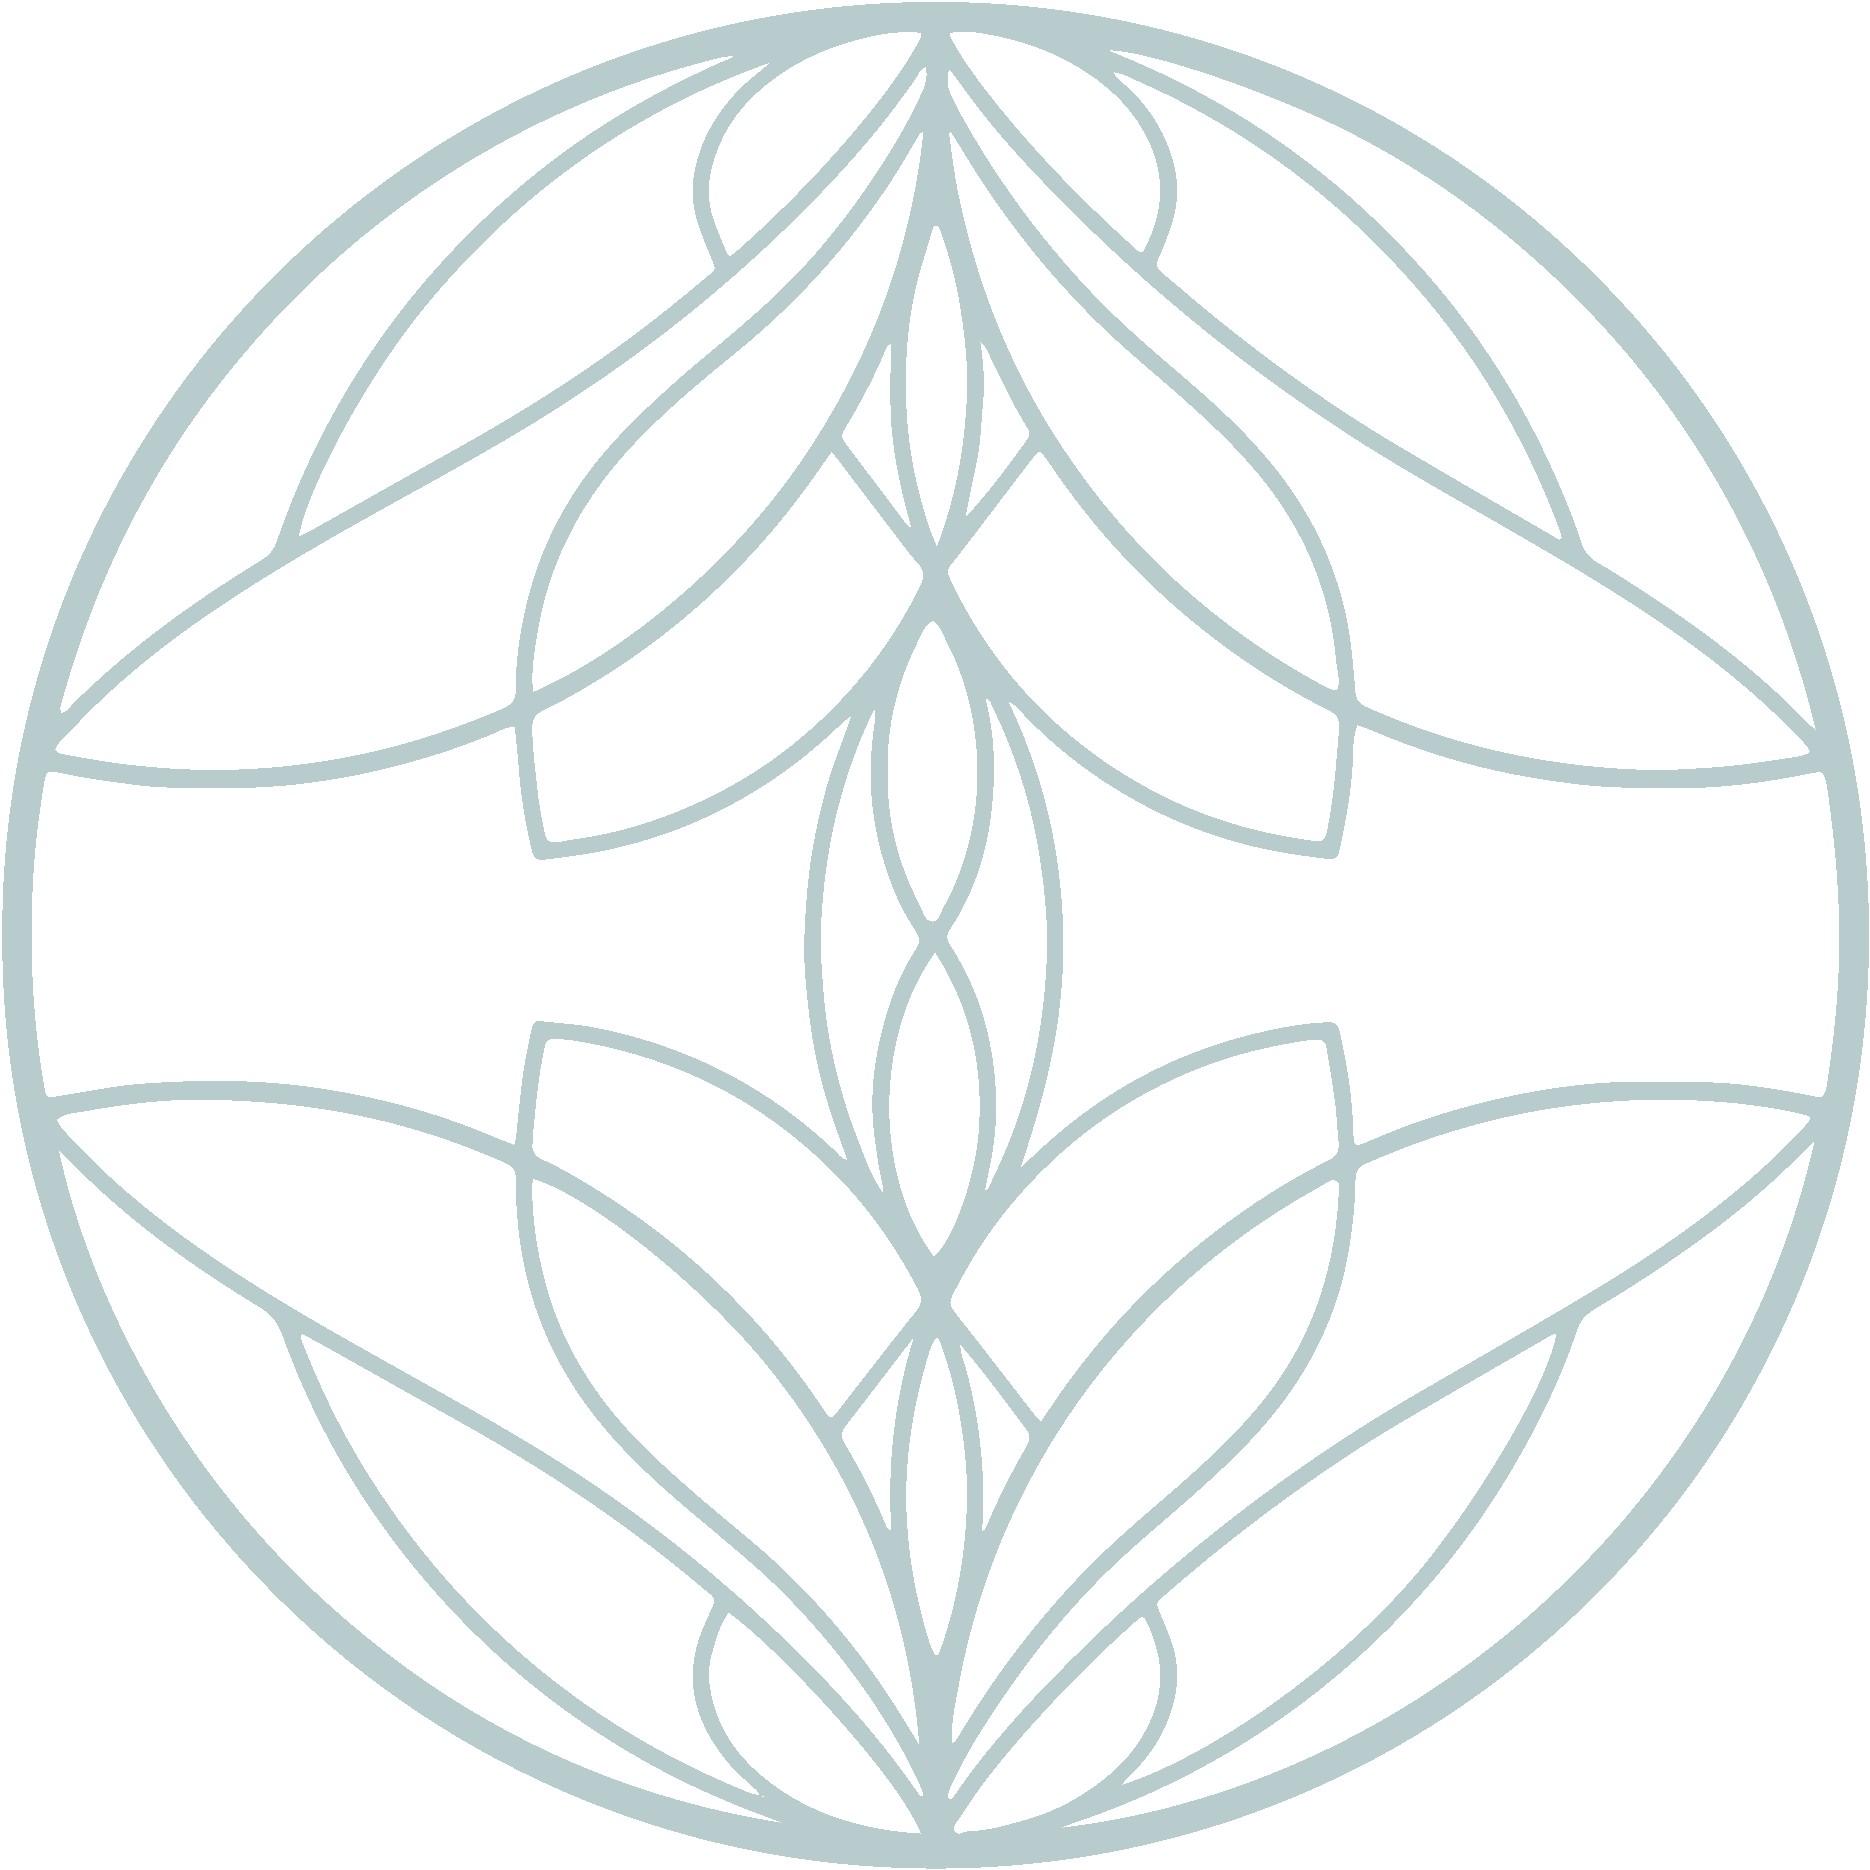 Sabrina Borg - Acupuncture & Chinese Medicine